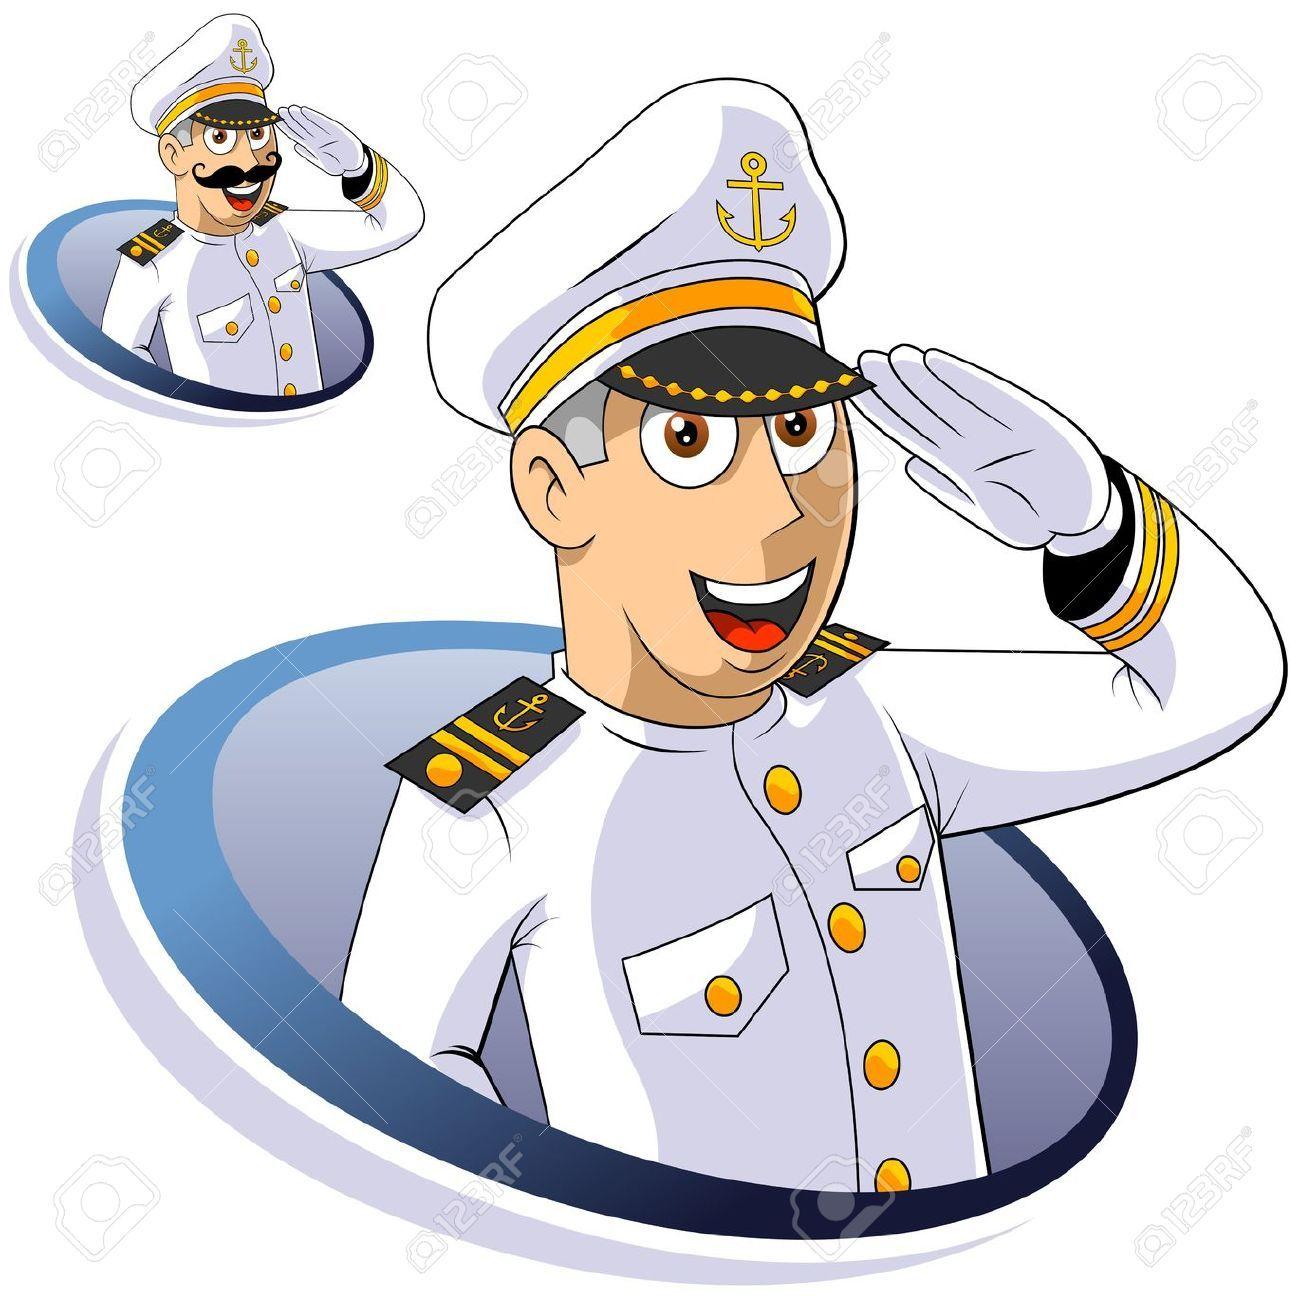 Dessin Capitaine Navire Recherche Google Cartoon Cartoons Uk Sailor